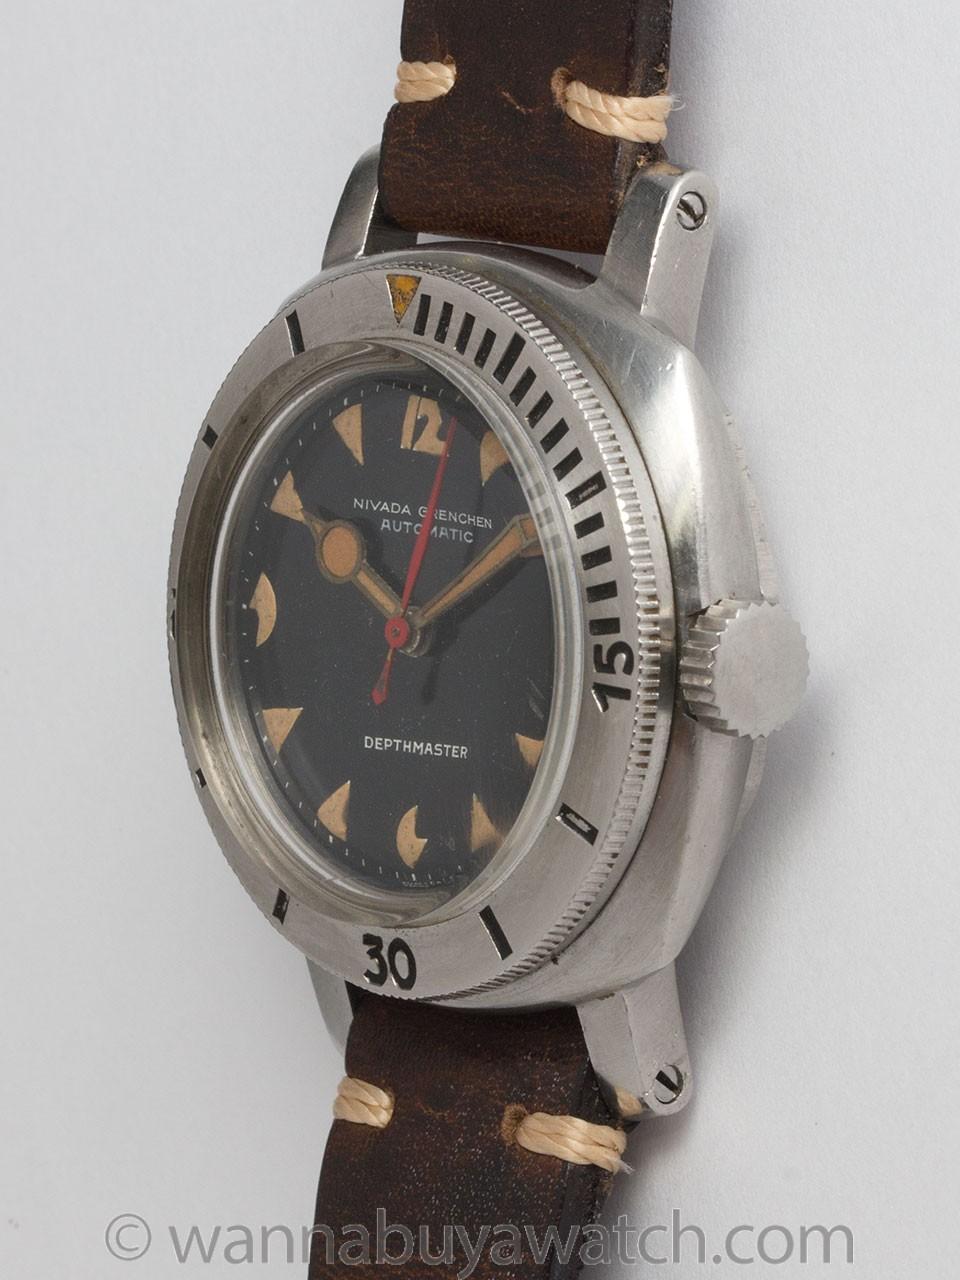 Nivada Grenchen Dephthmaster Diver's circa 1960